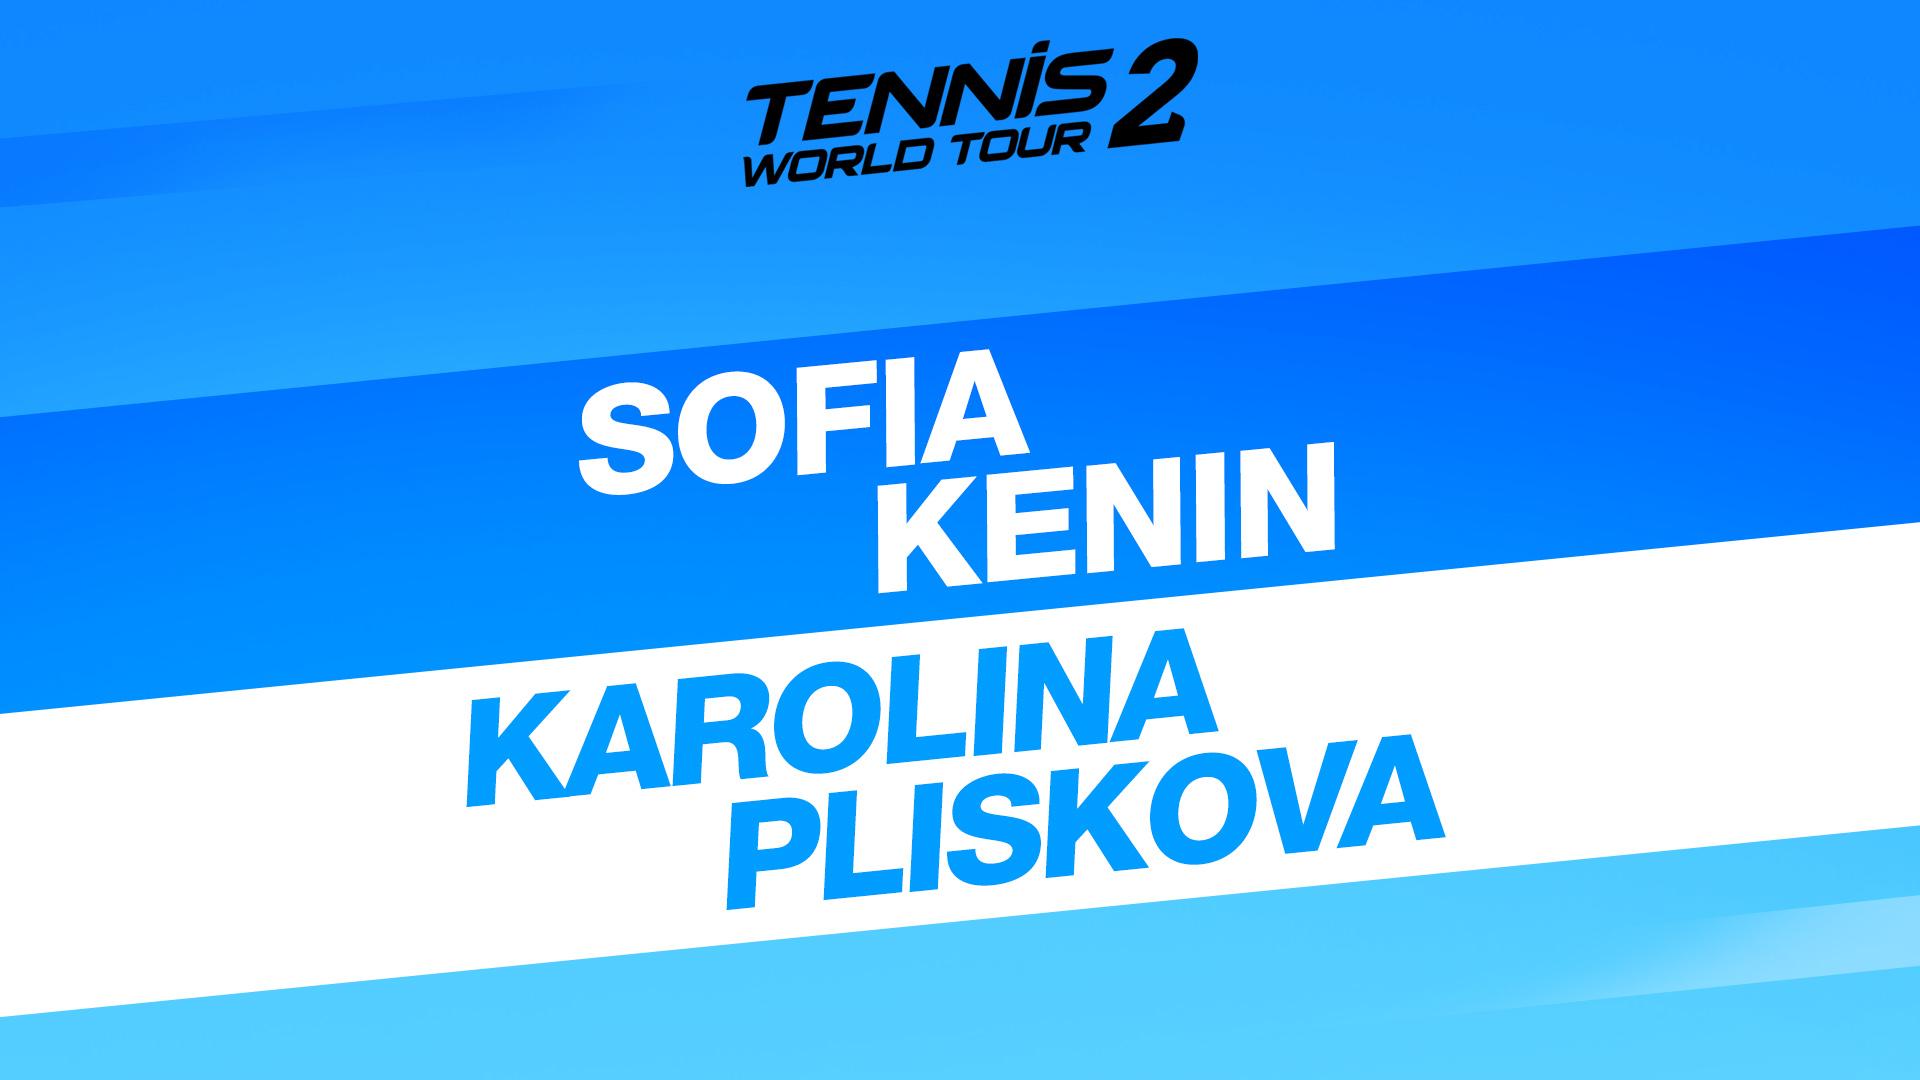 Tennis World Tour 2 - Sofia Kenin & Karolina Pliskova